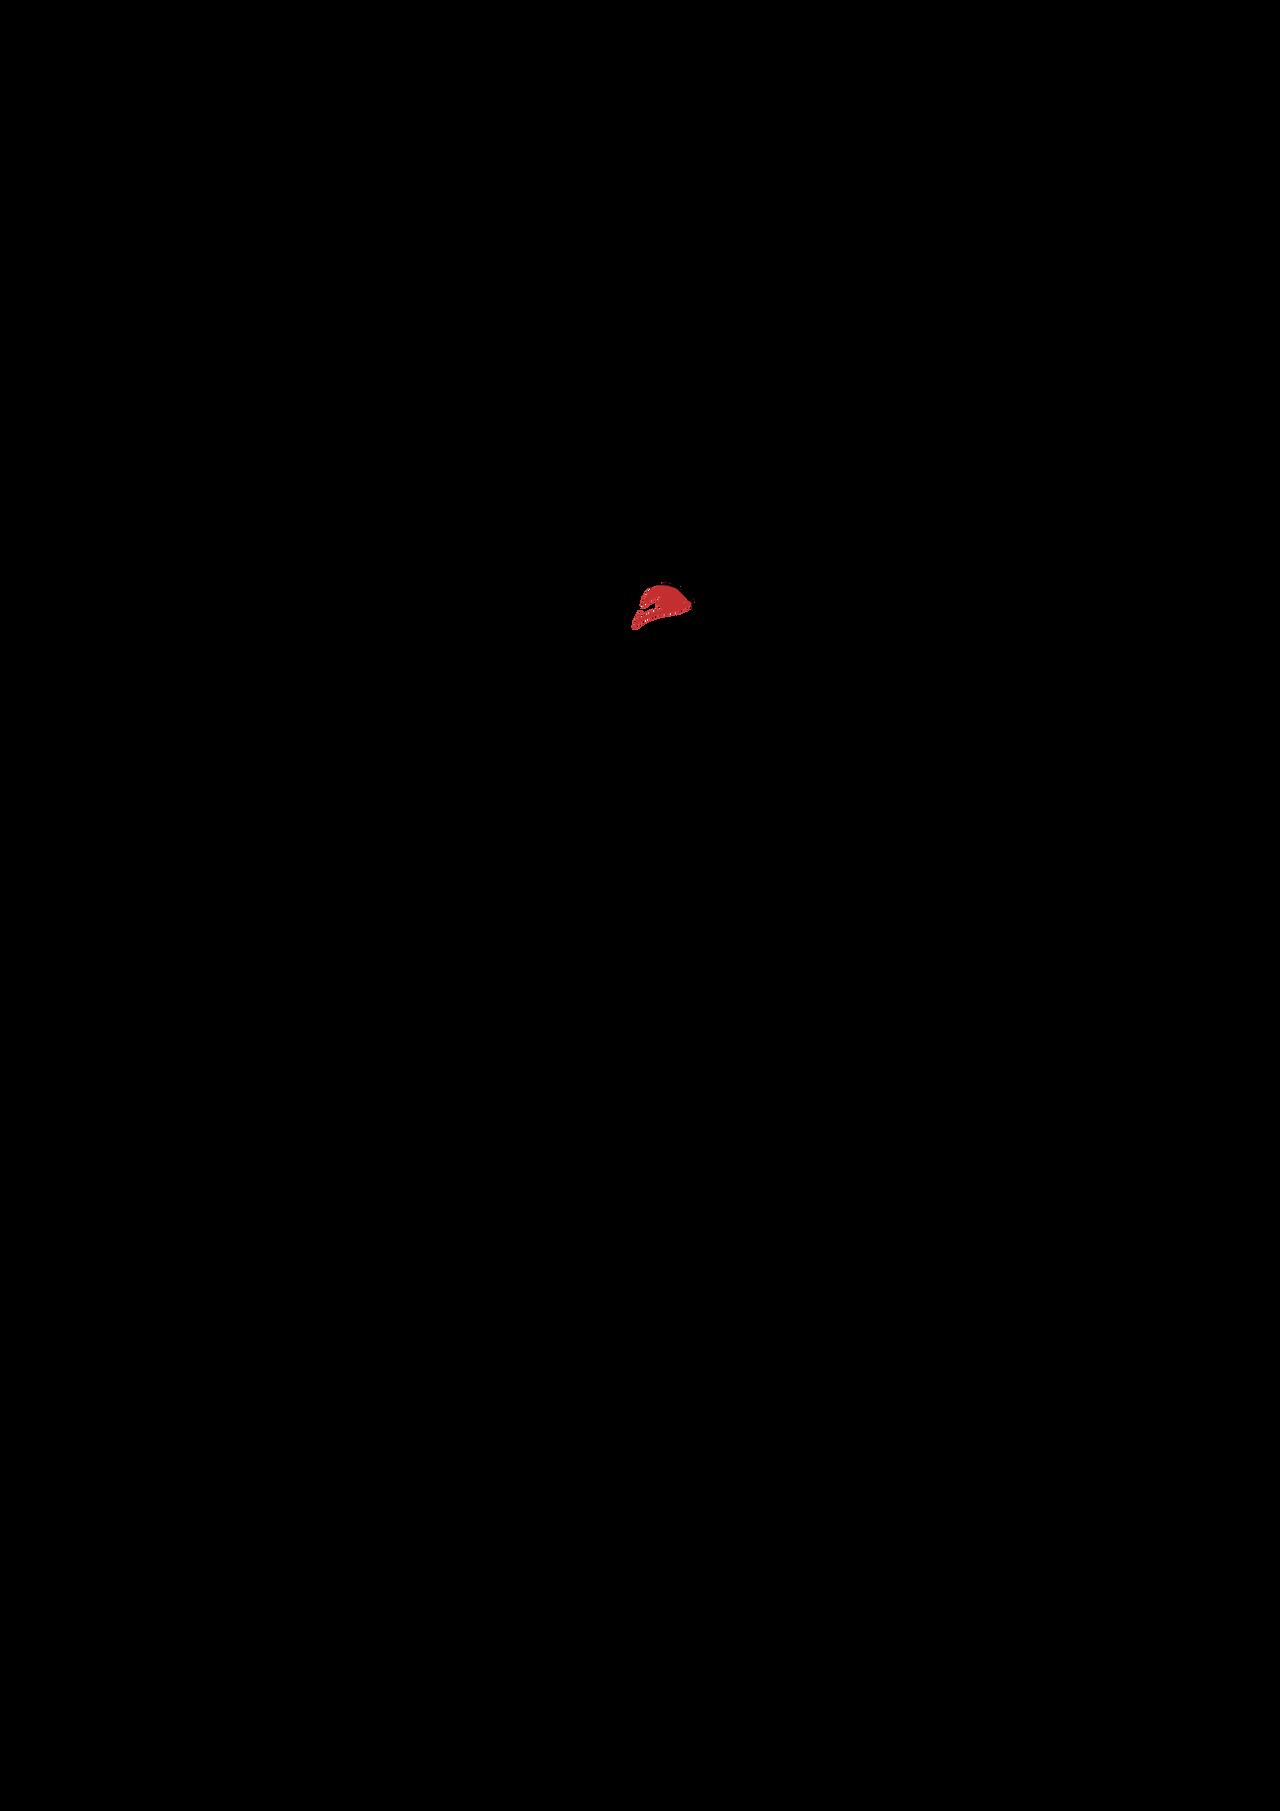 Natsu Lineart : Natsu lineart ft vol by tobeyd on deviantart